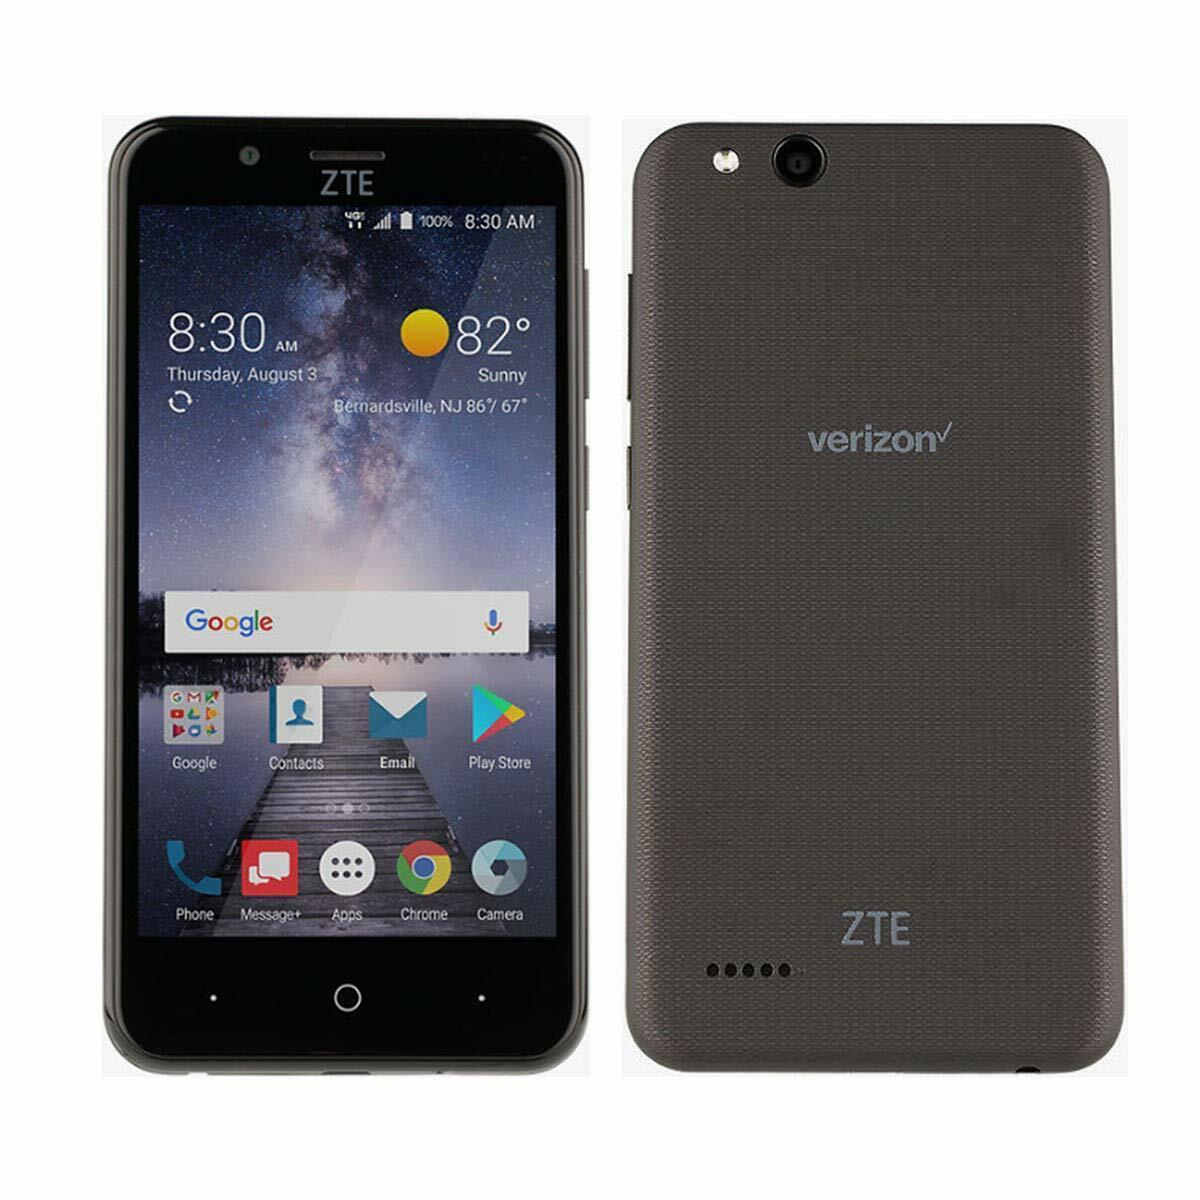 ZTE Z839 Blade Vantage Prepaid Smart Phone LTE Verizon Cell Phone Black